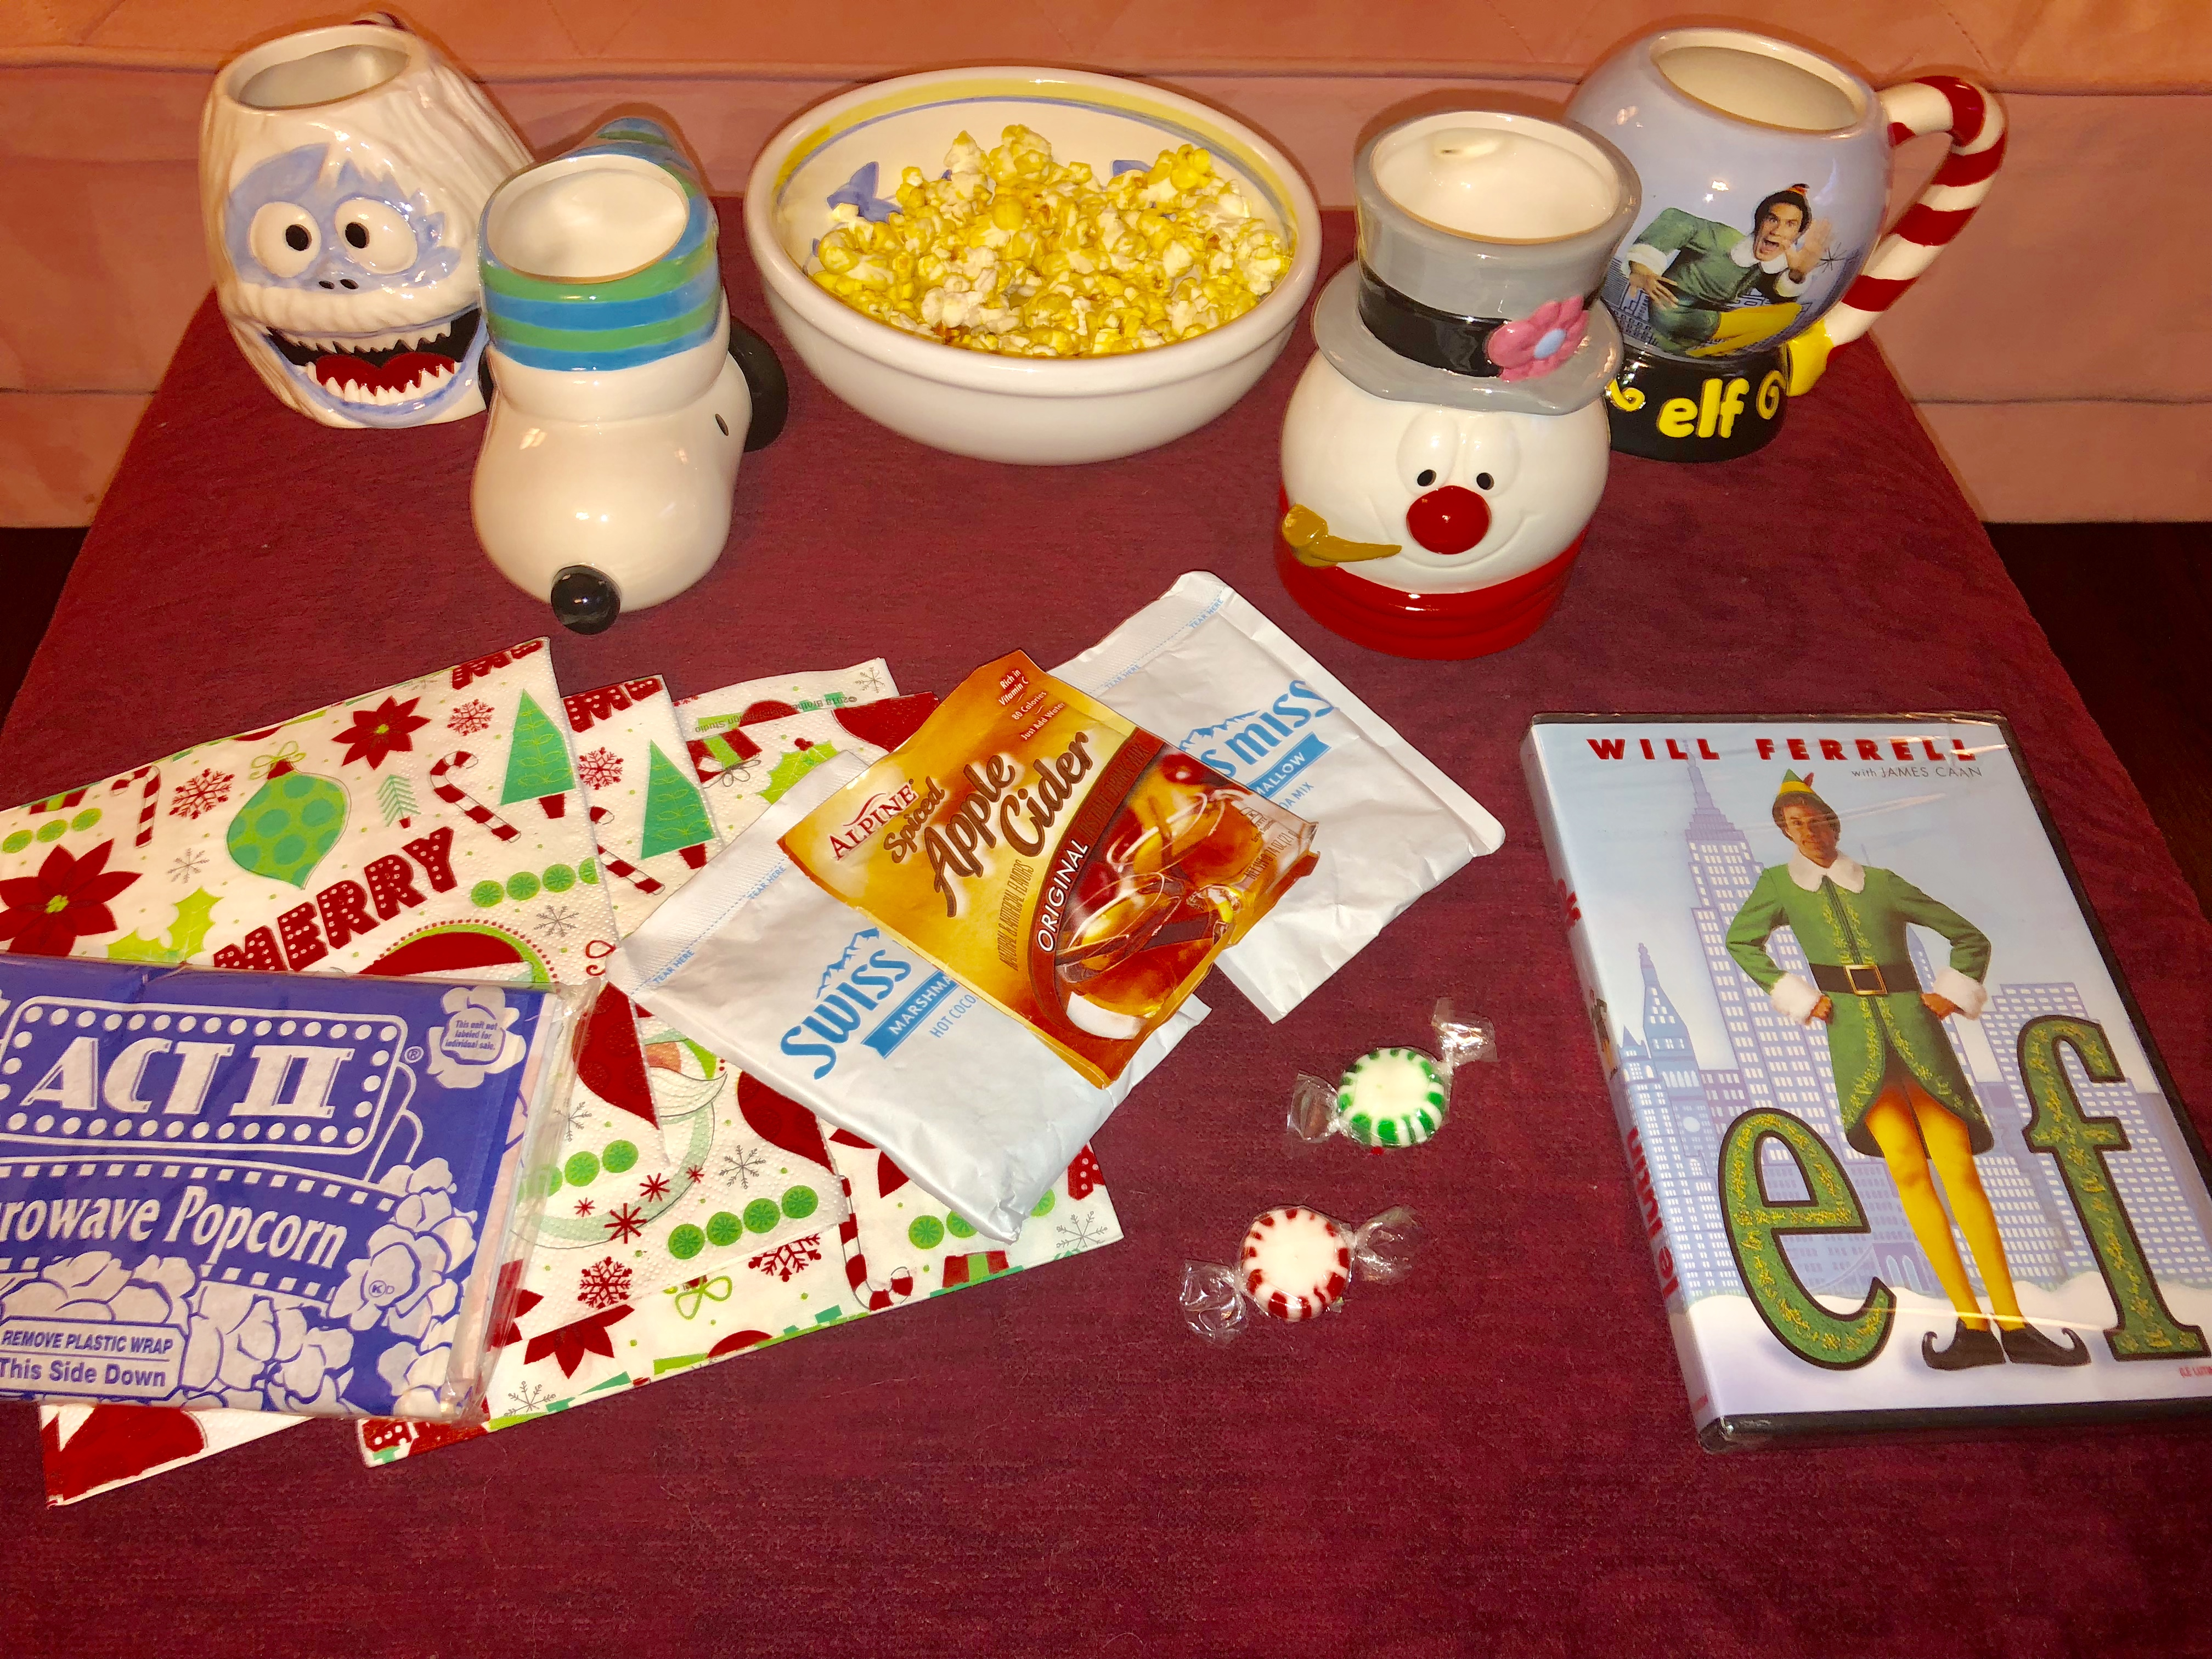 Family Movie Night Crafts and Treats